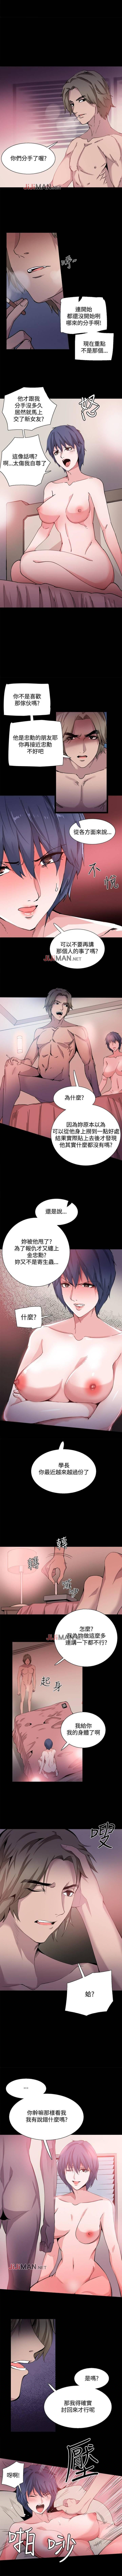 【已完结】Bodychange(作者:Seize & 死亡節奏) 第1~33话 128